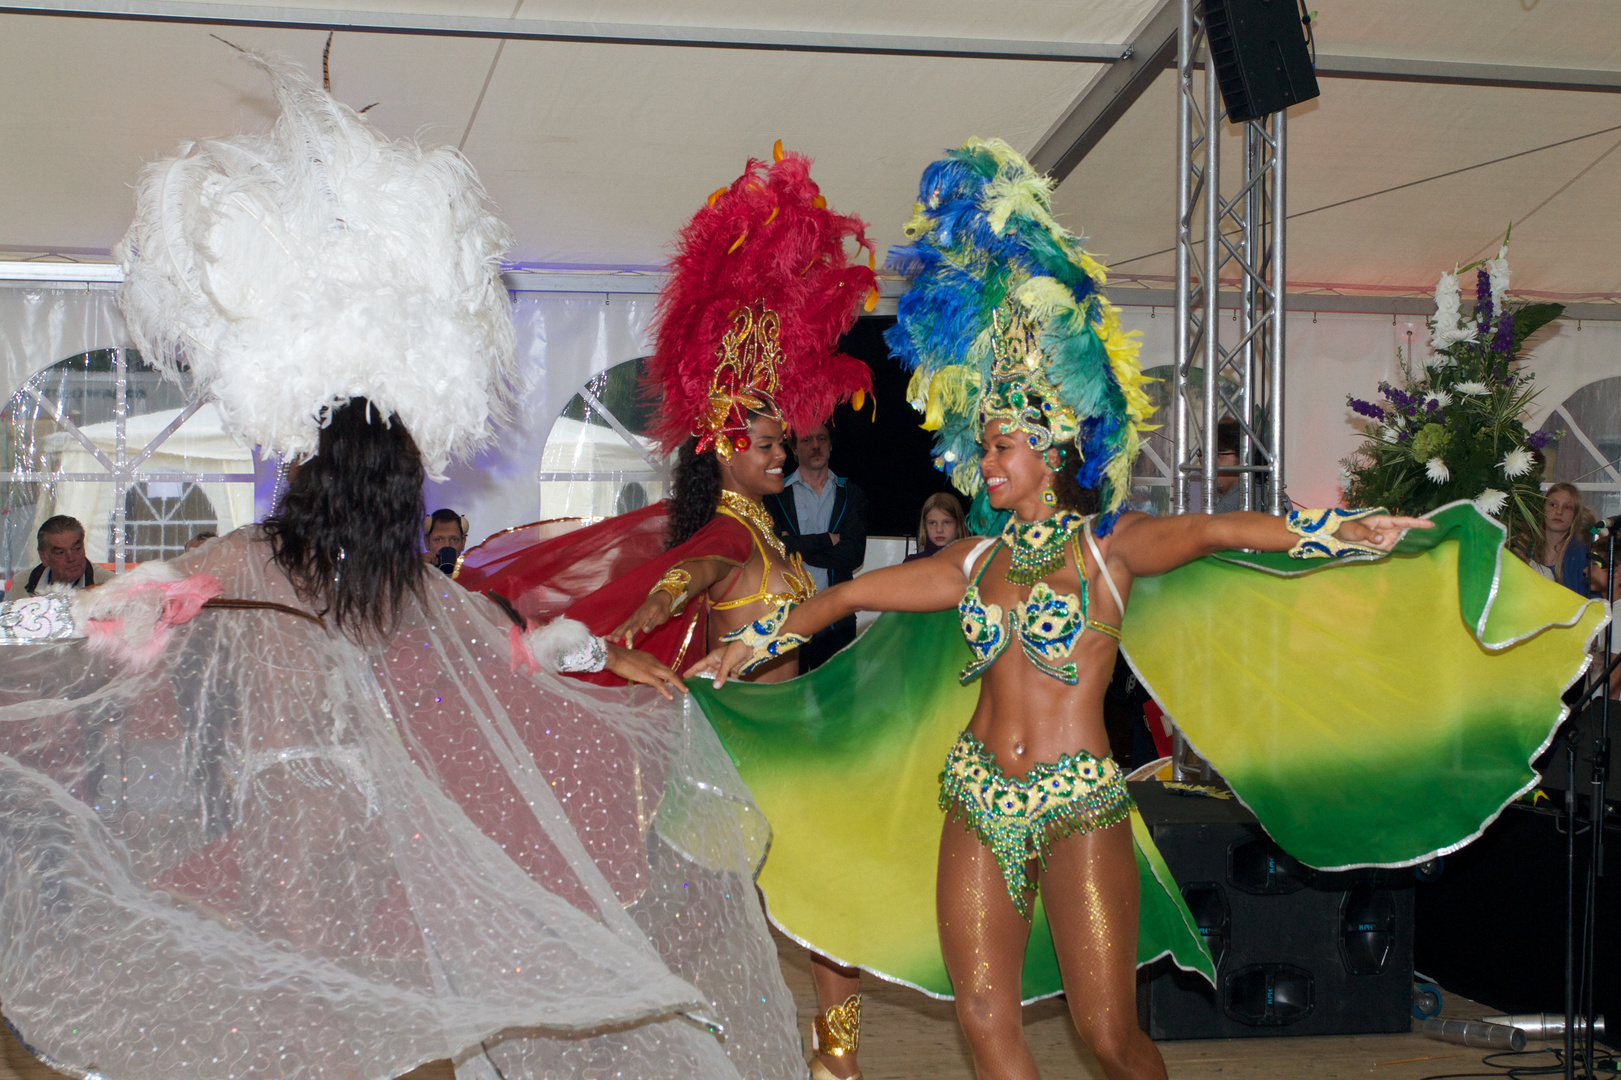 Copacabana-Sambashow Nr. 4624